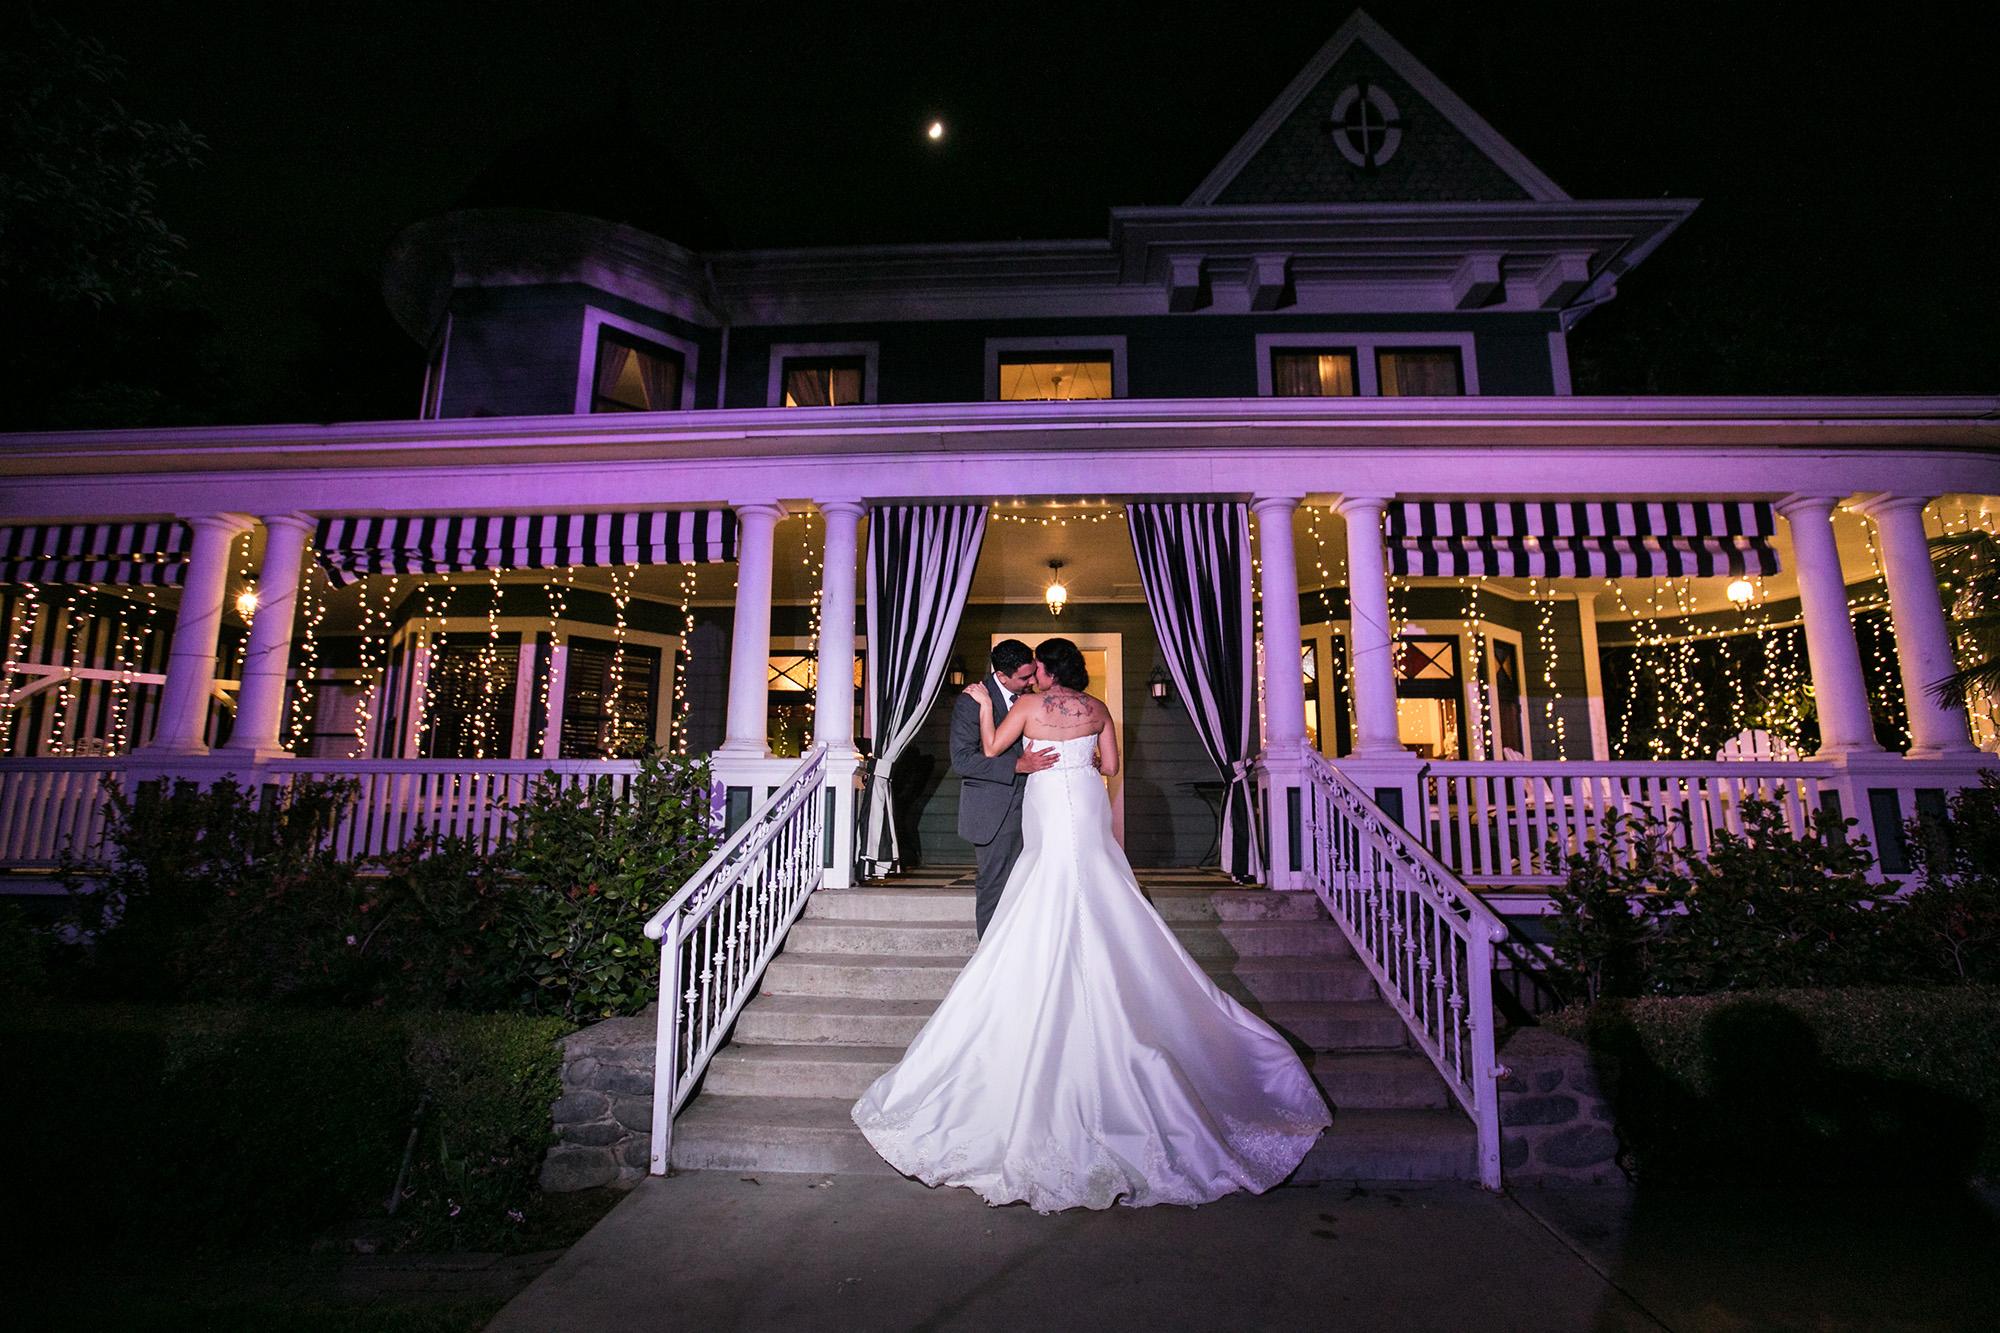 christmas-house-weddings-receptions-carrie-vines-035.jpg